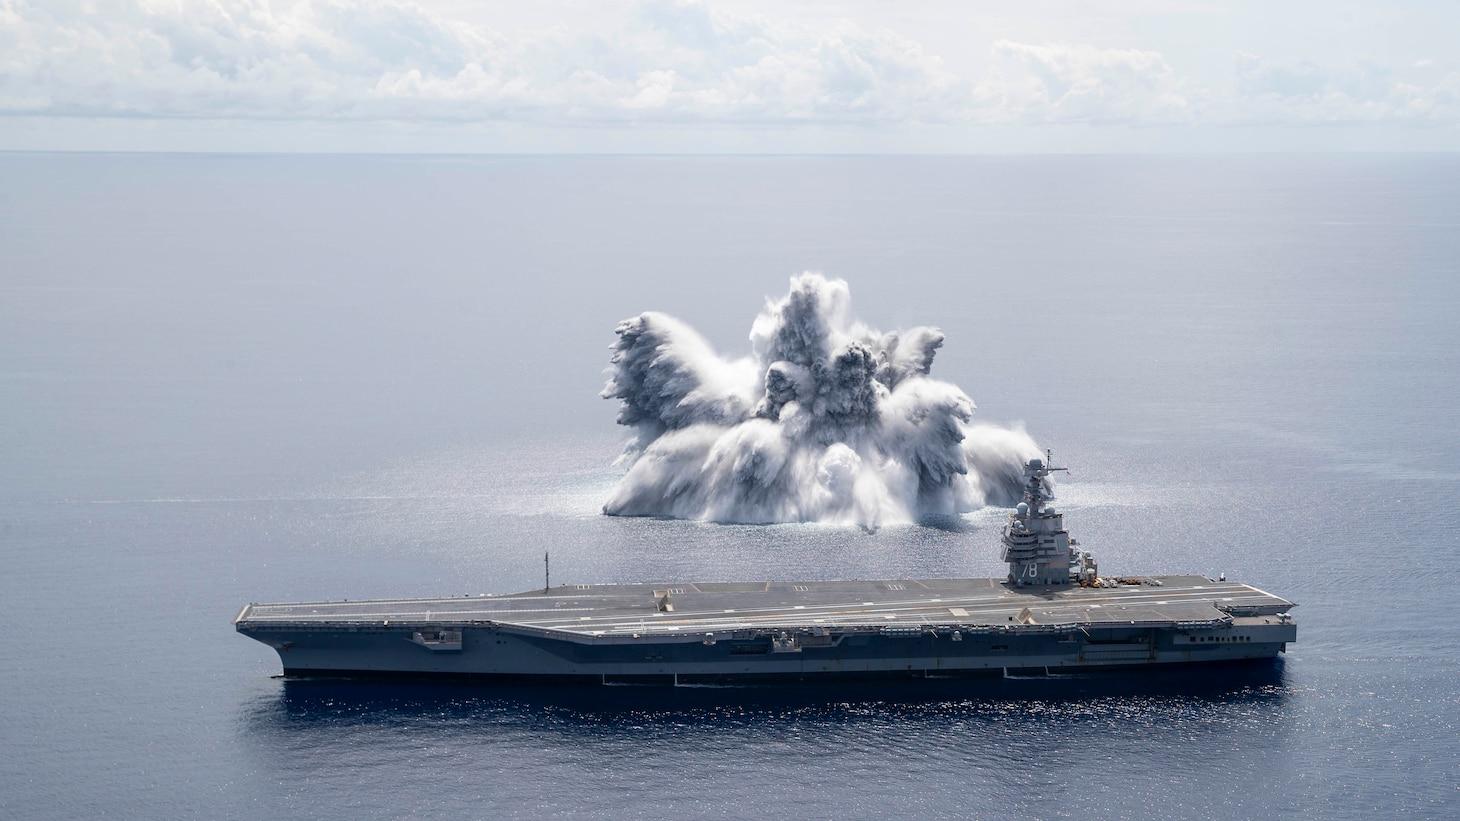 www.navy.mil